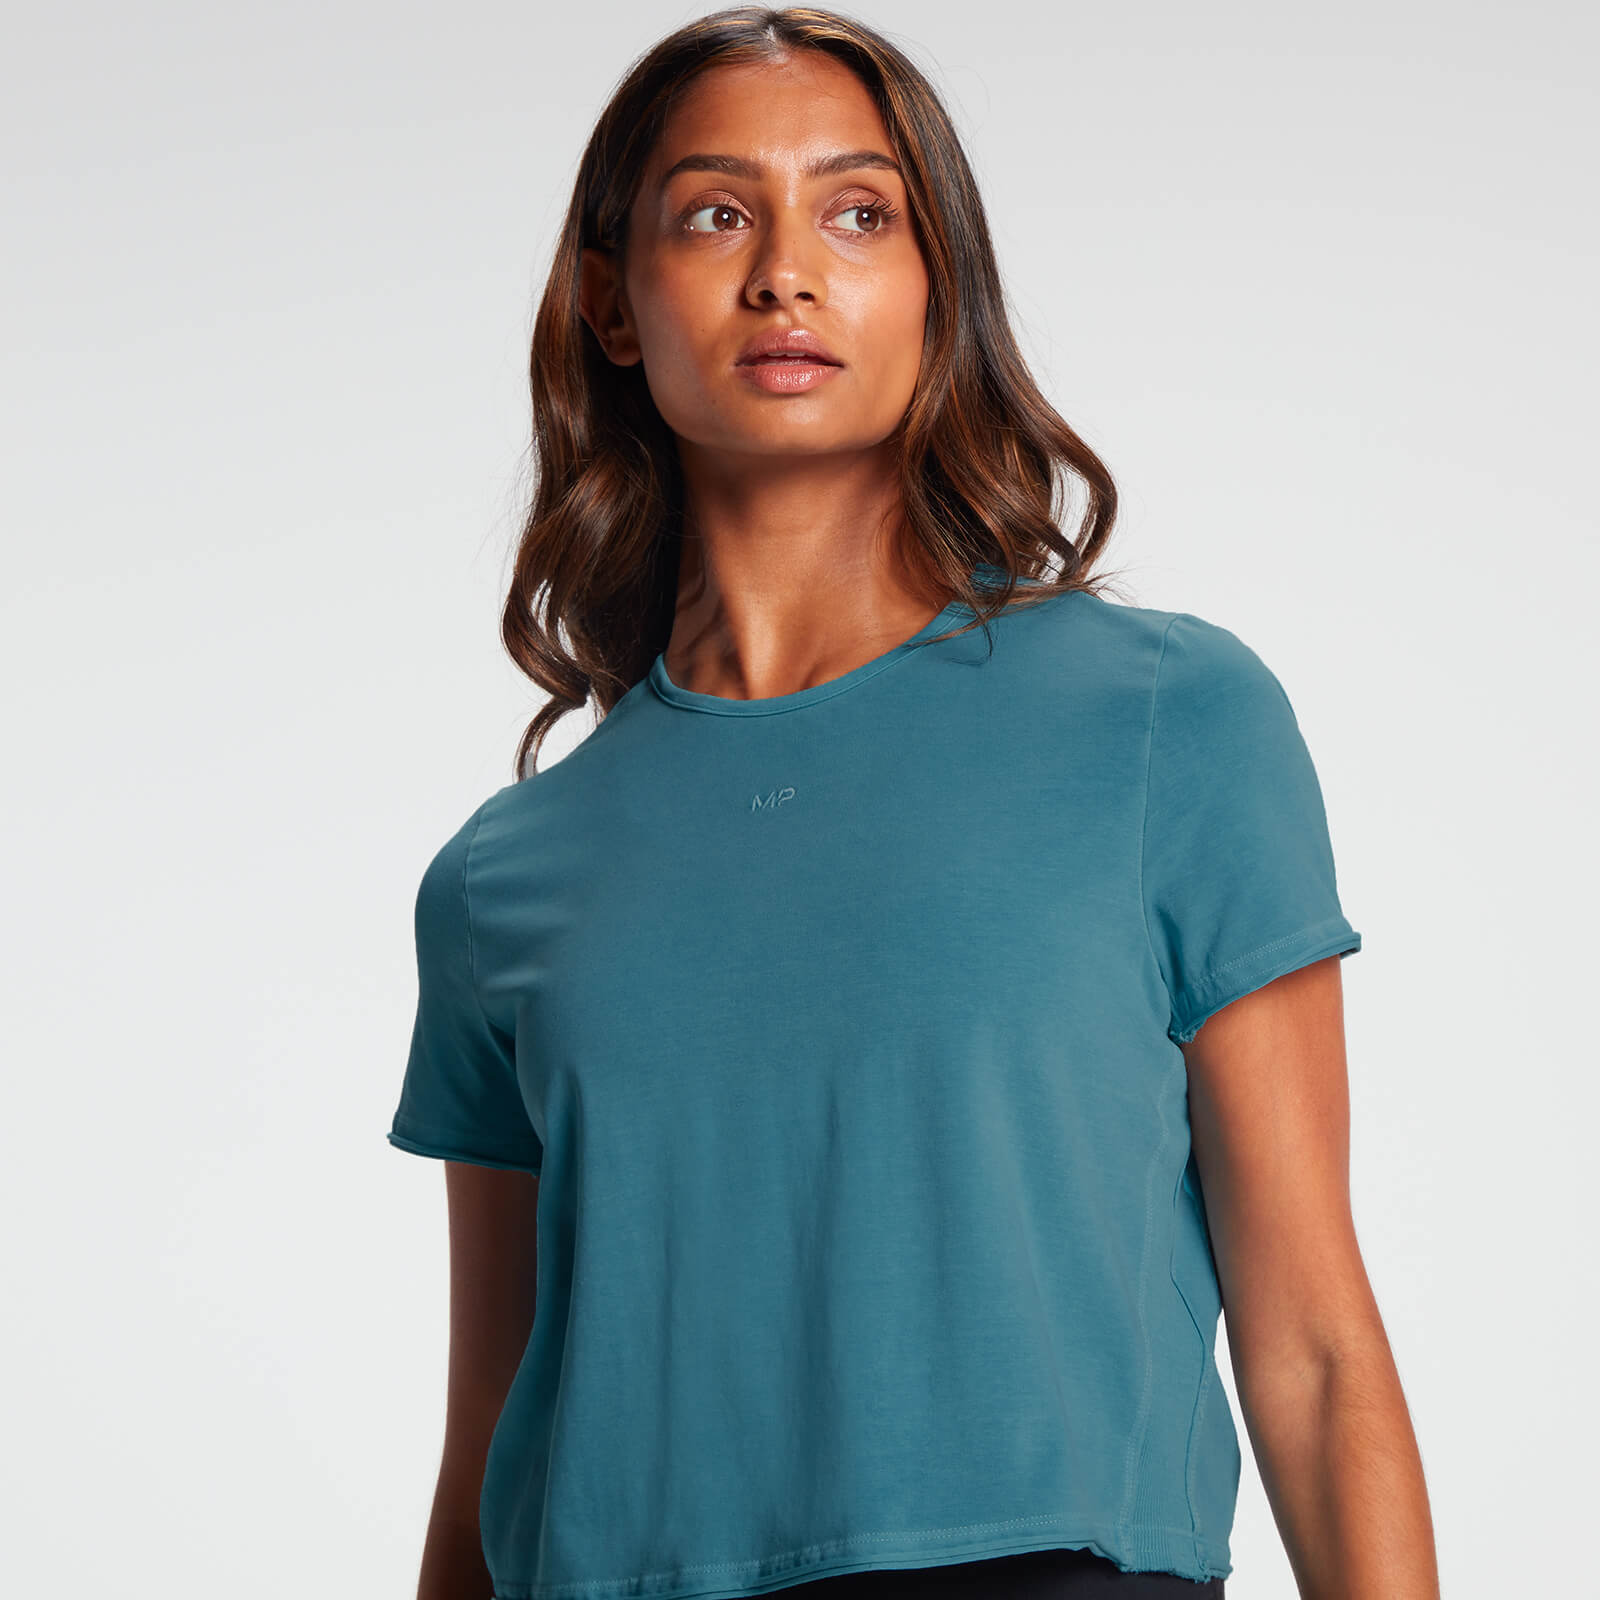 MP Women's Raw Training Cropped T-Shirt - Ocean Blue  - XL